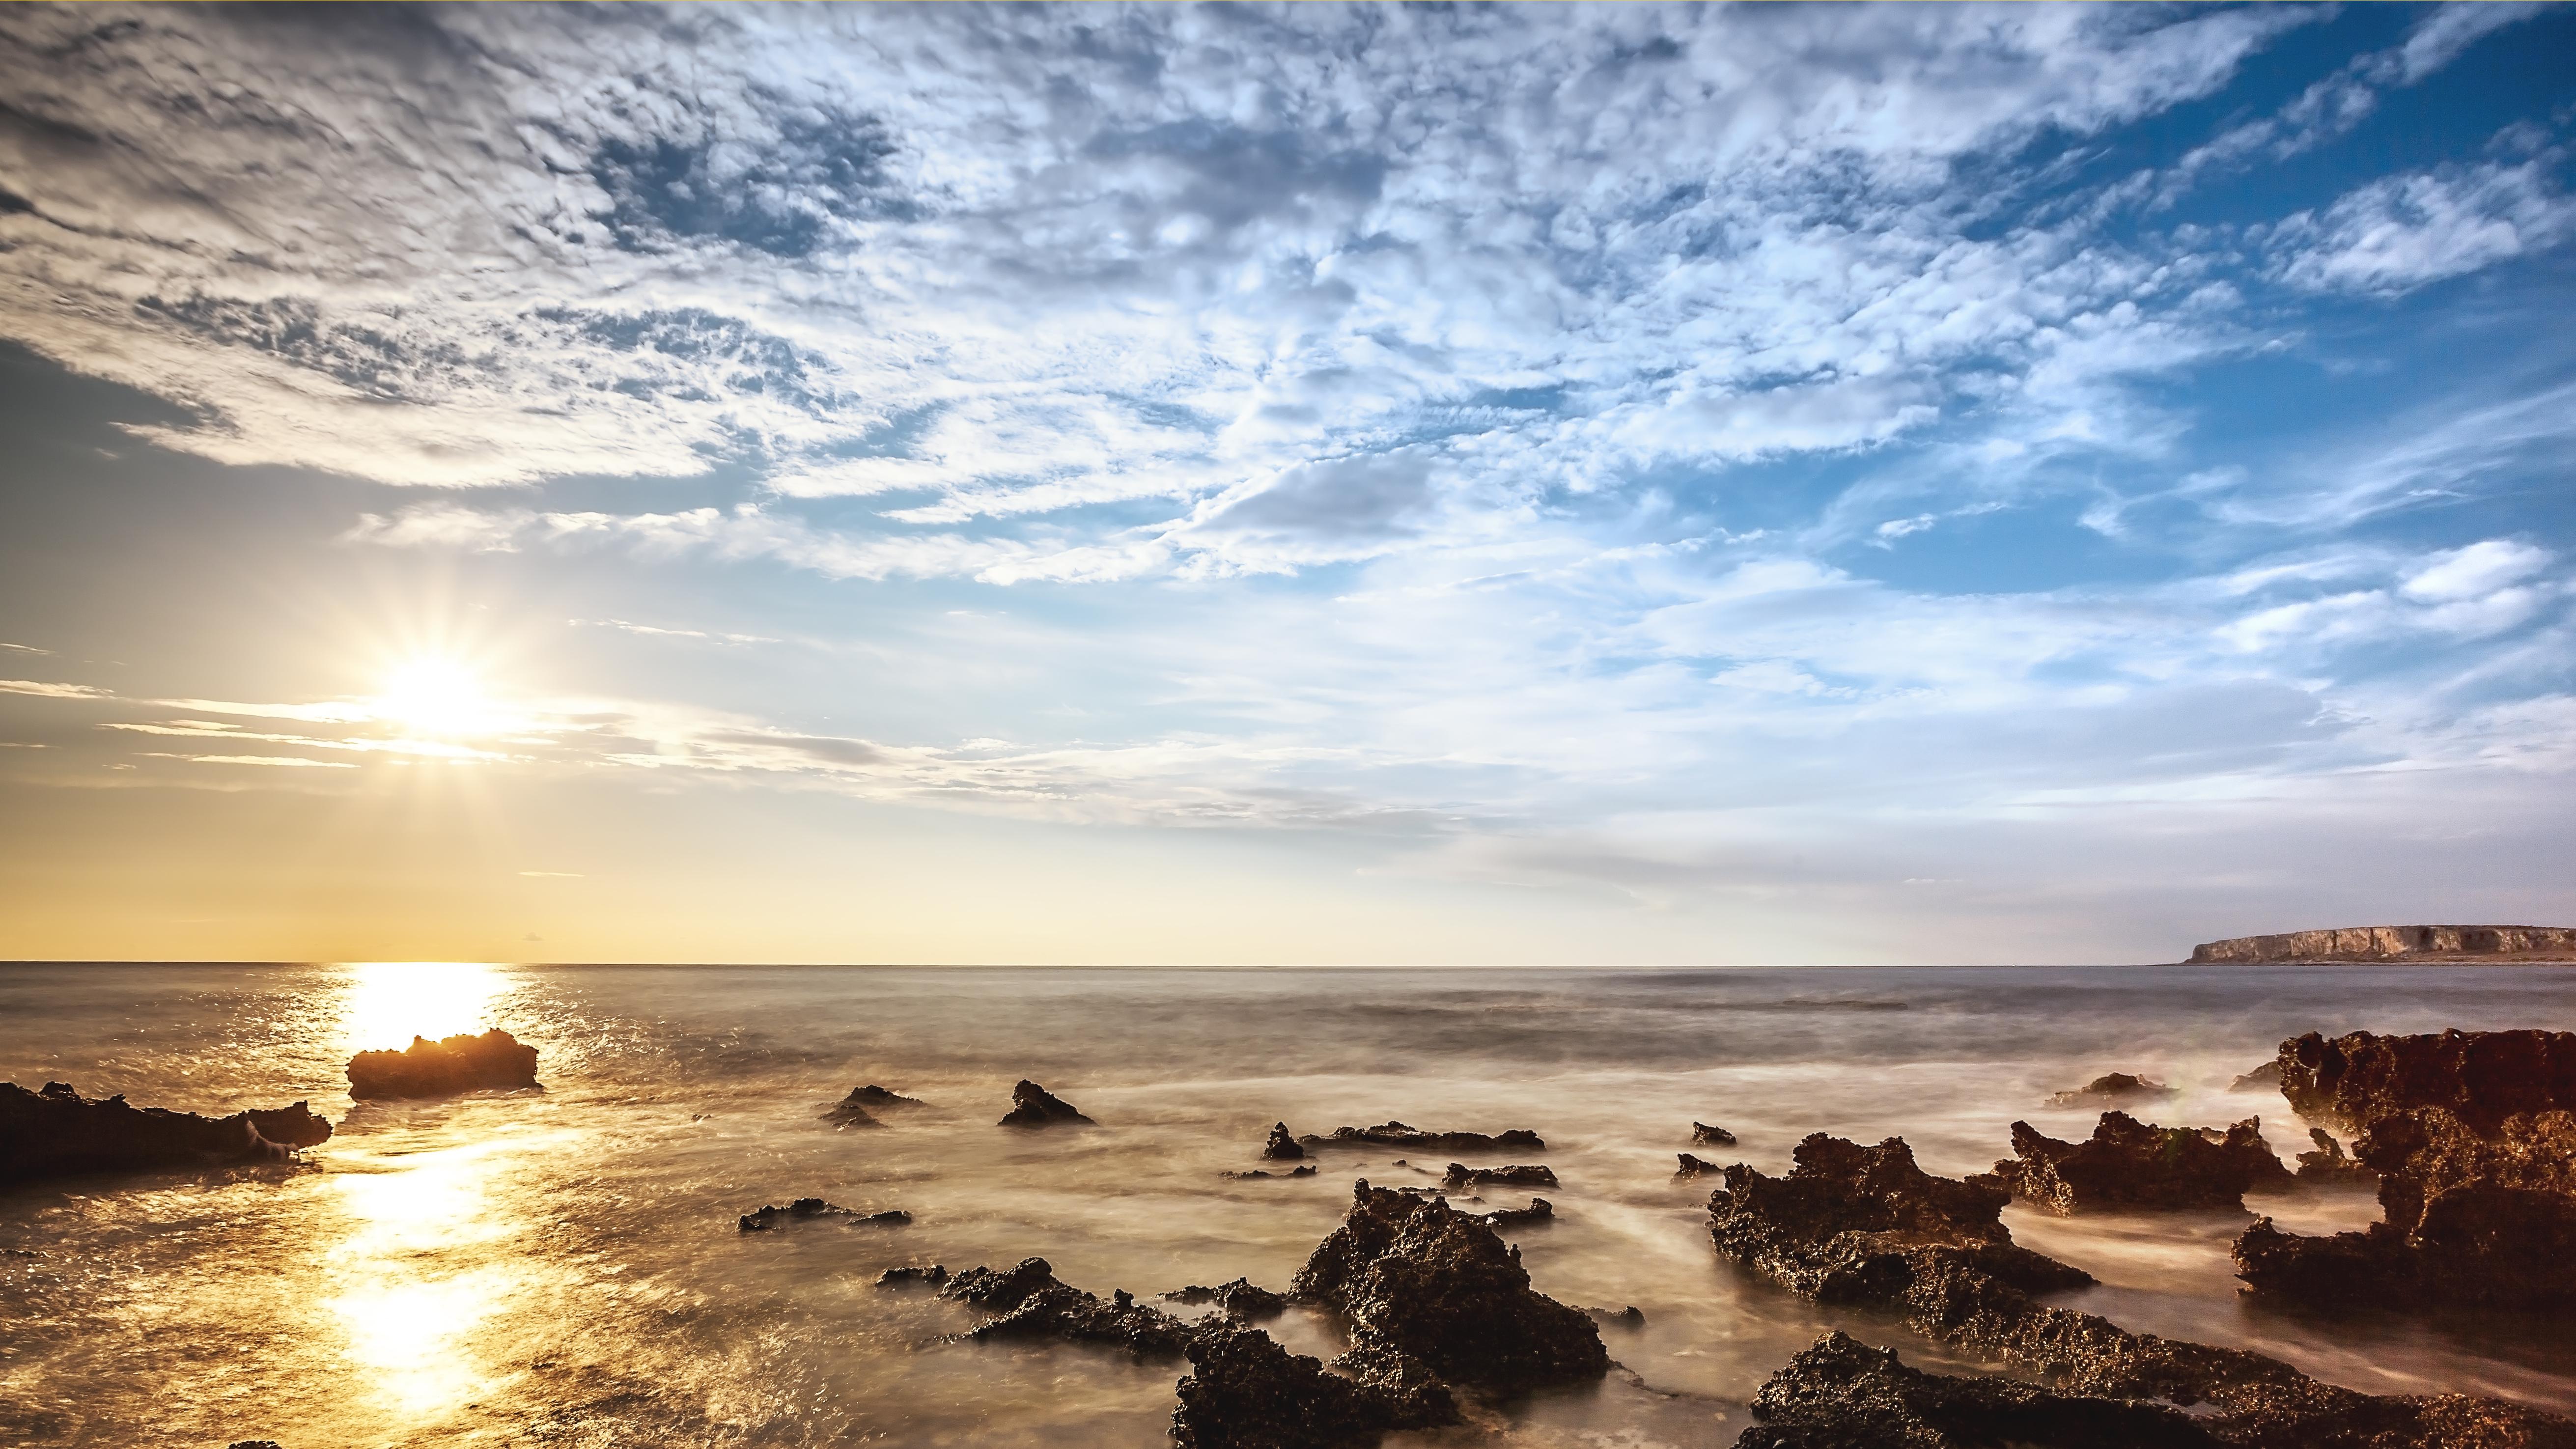 природа море солнце горизонт небо облака  № 717743 без смс